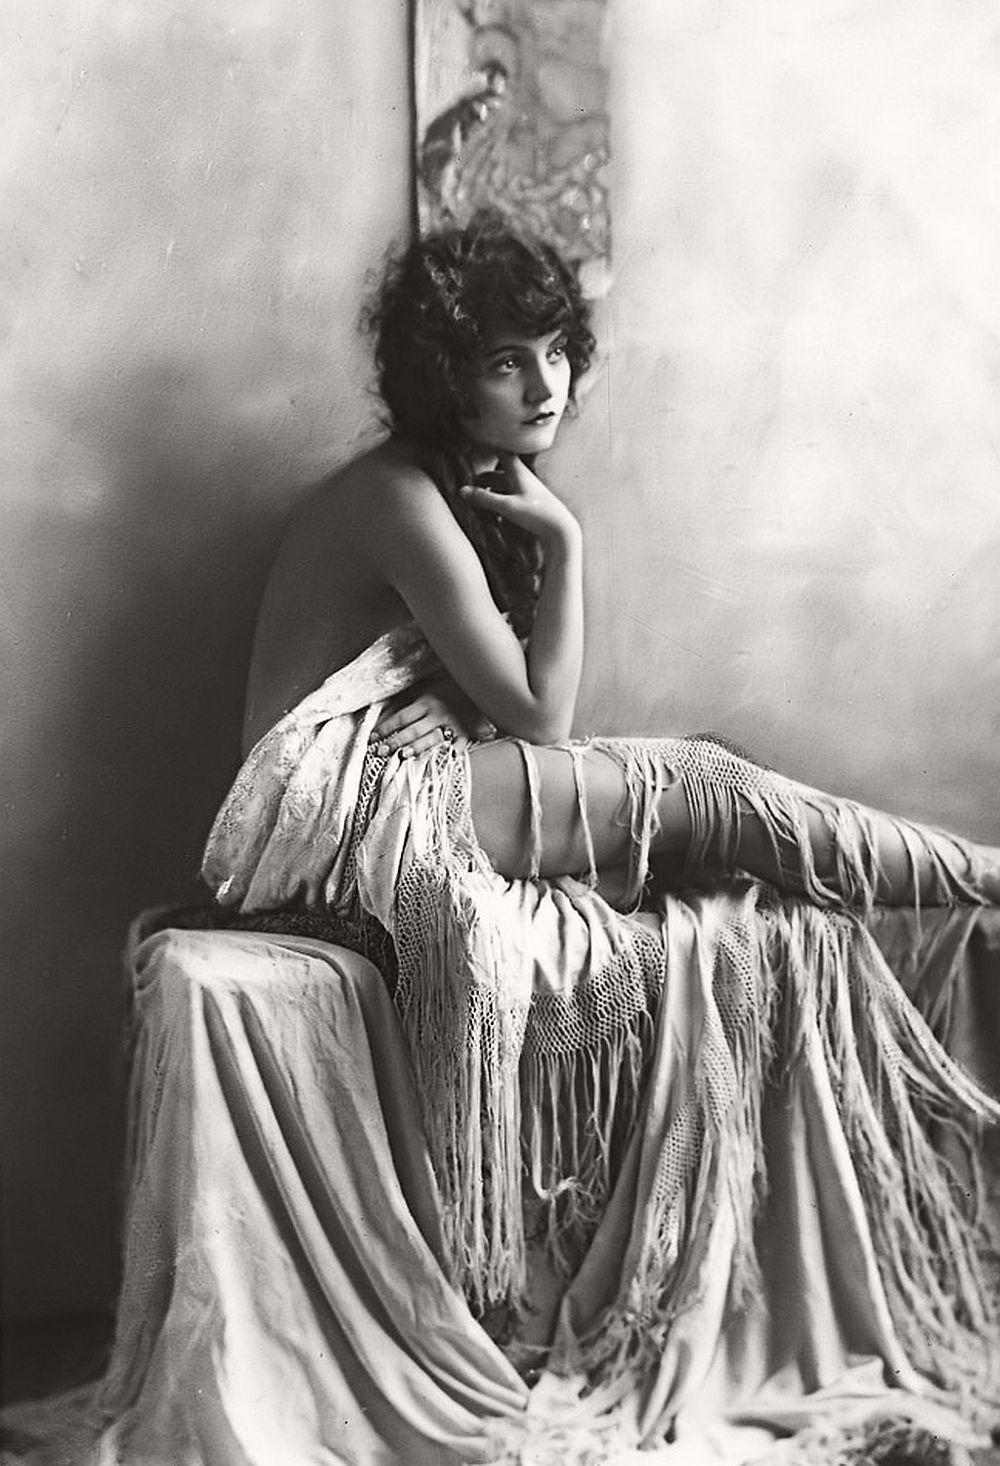 vintage: nudes/erotica (1920s) | monovisions